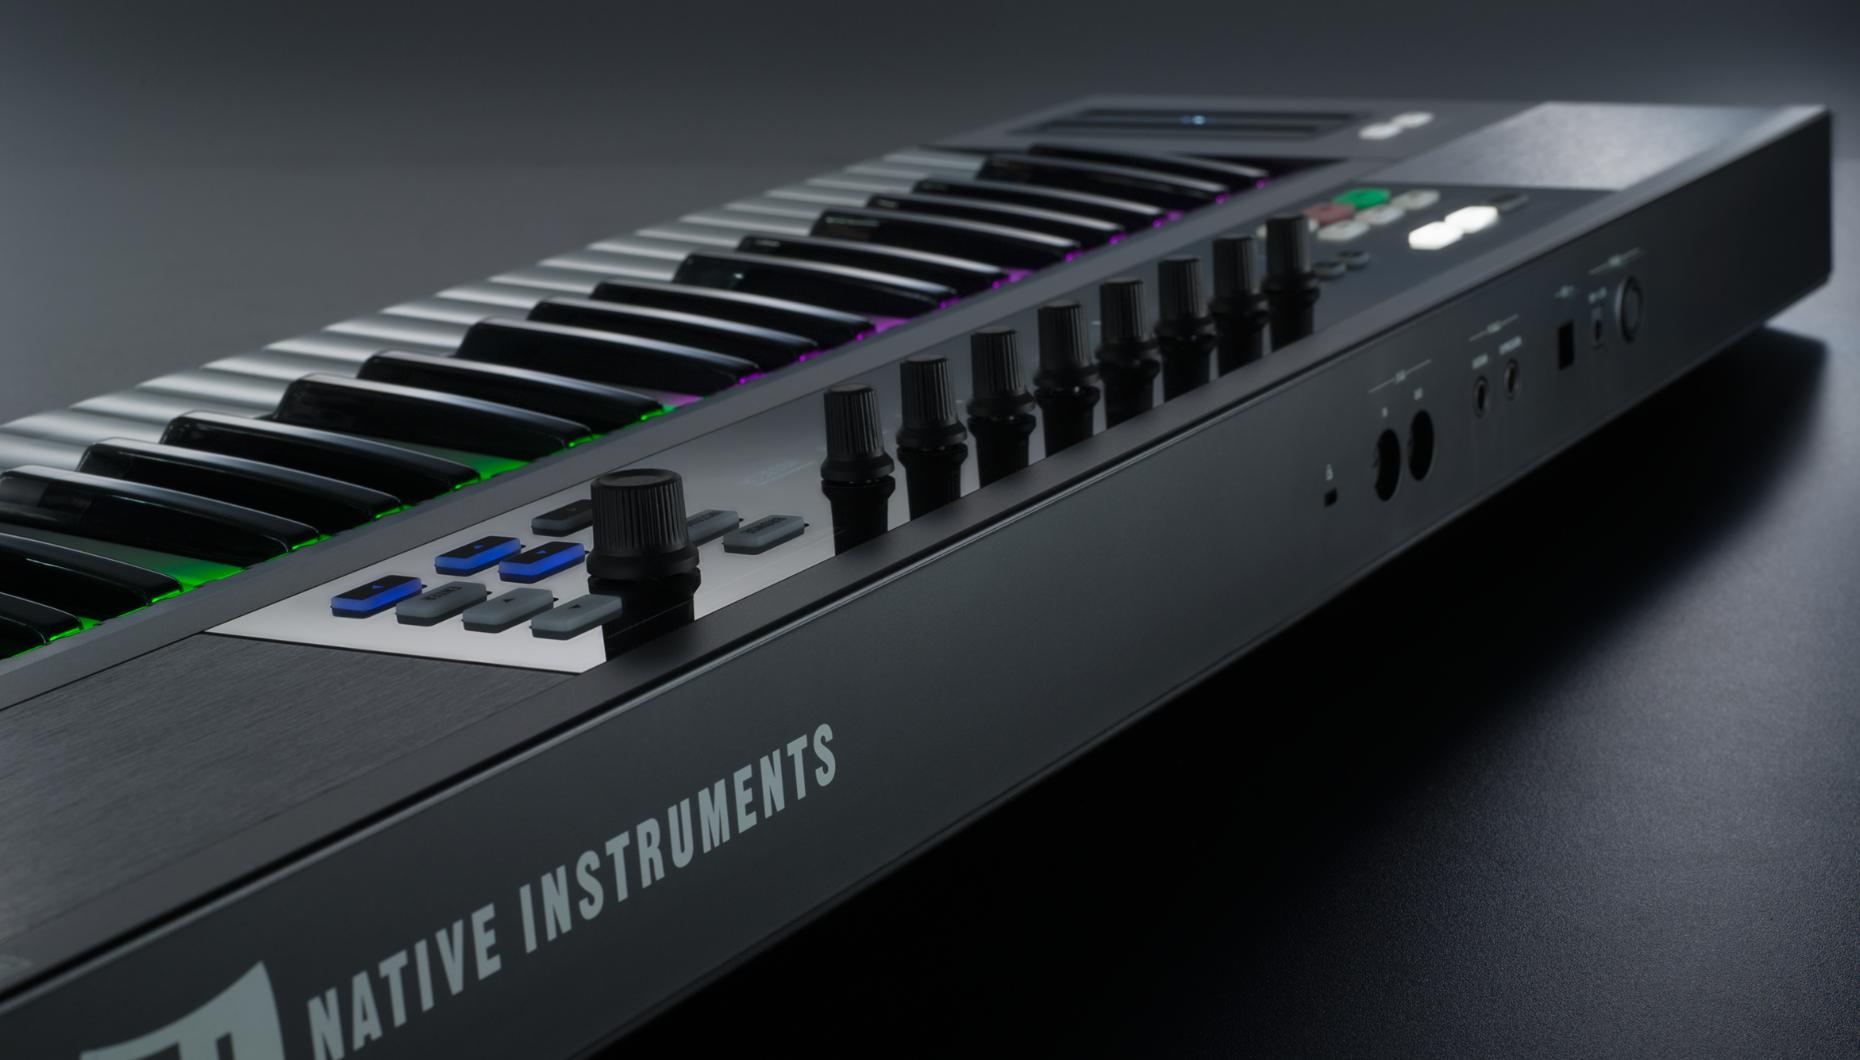 KOMPLETE KONTROL s88 - Native Instruments Kontrol S88  Master Keyboard!